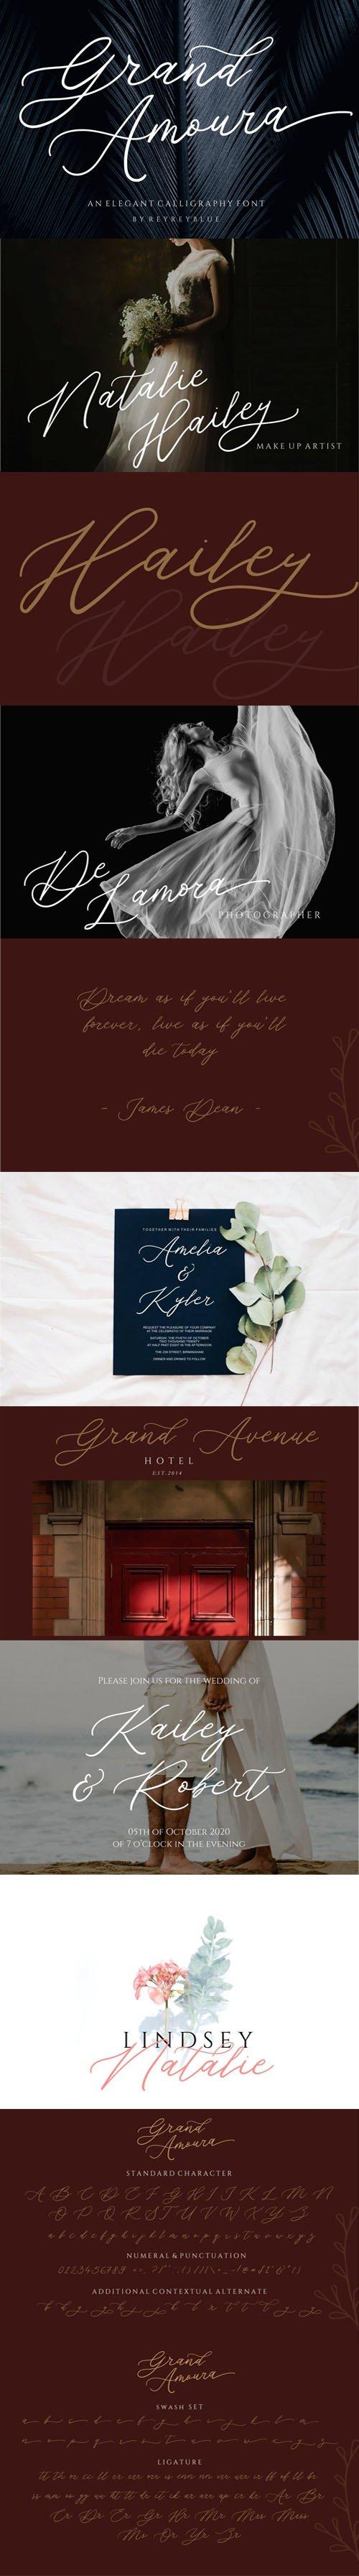 Grand Amoura - Elegant Calligraphy Font